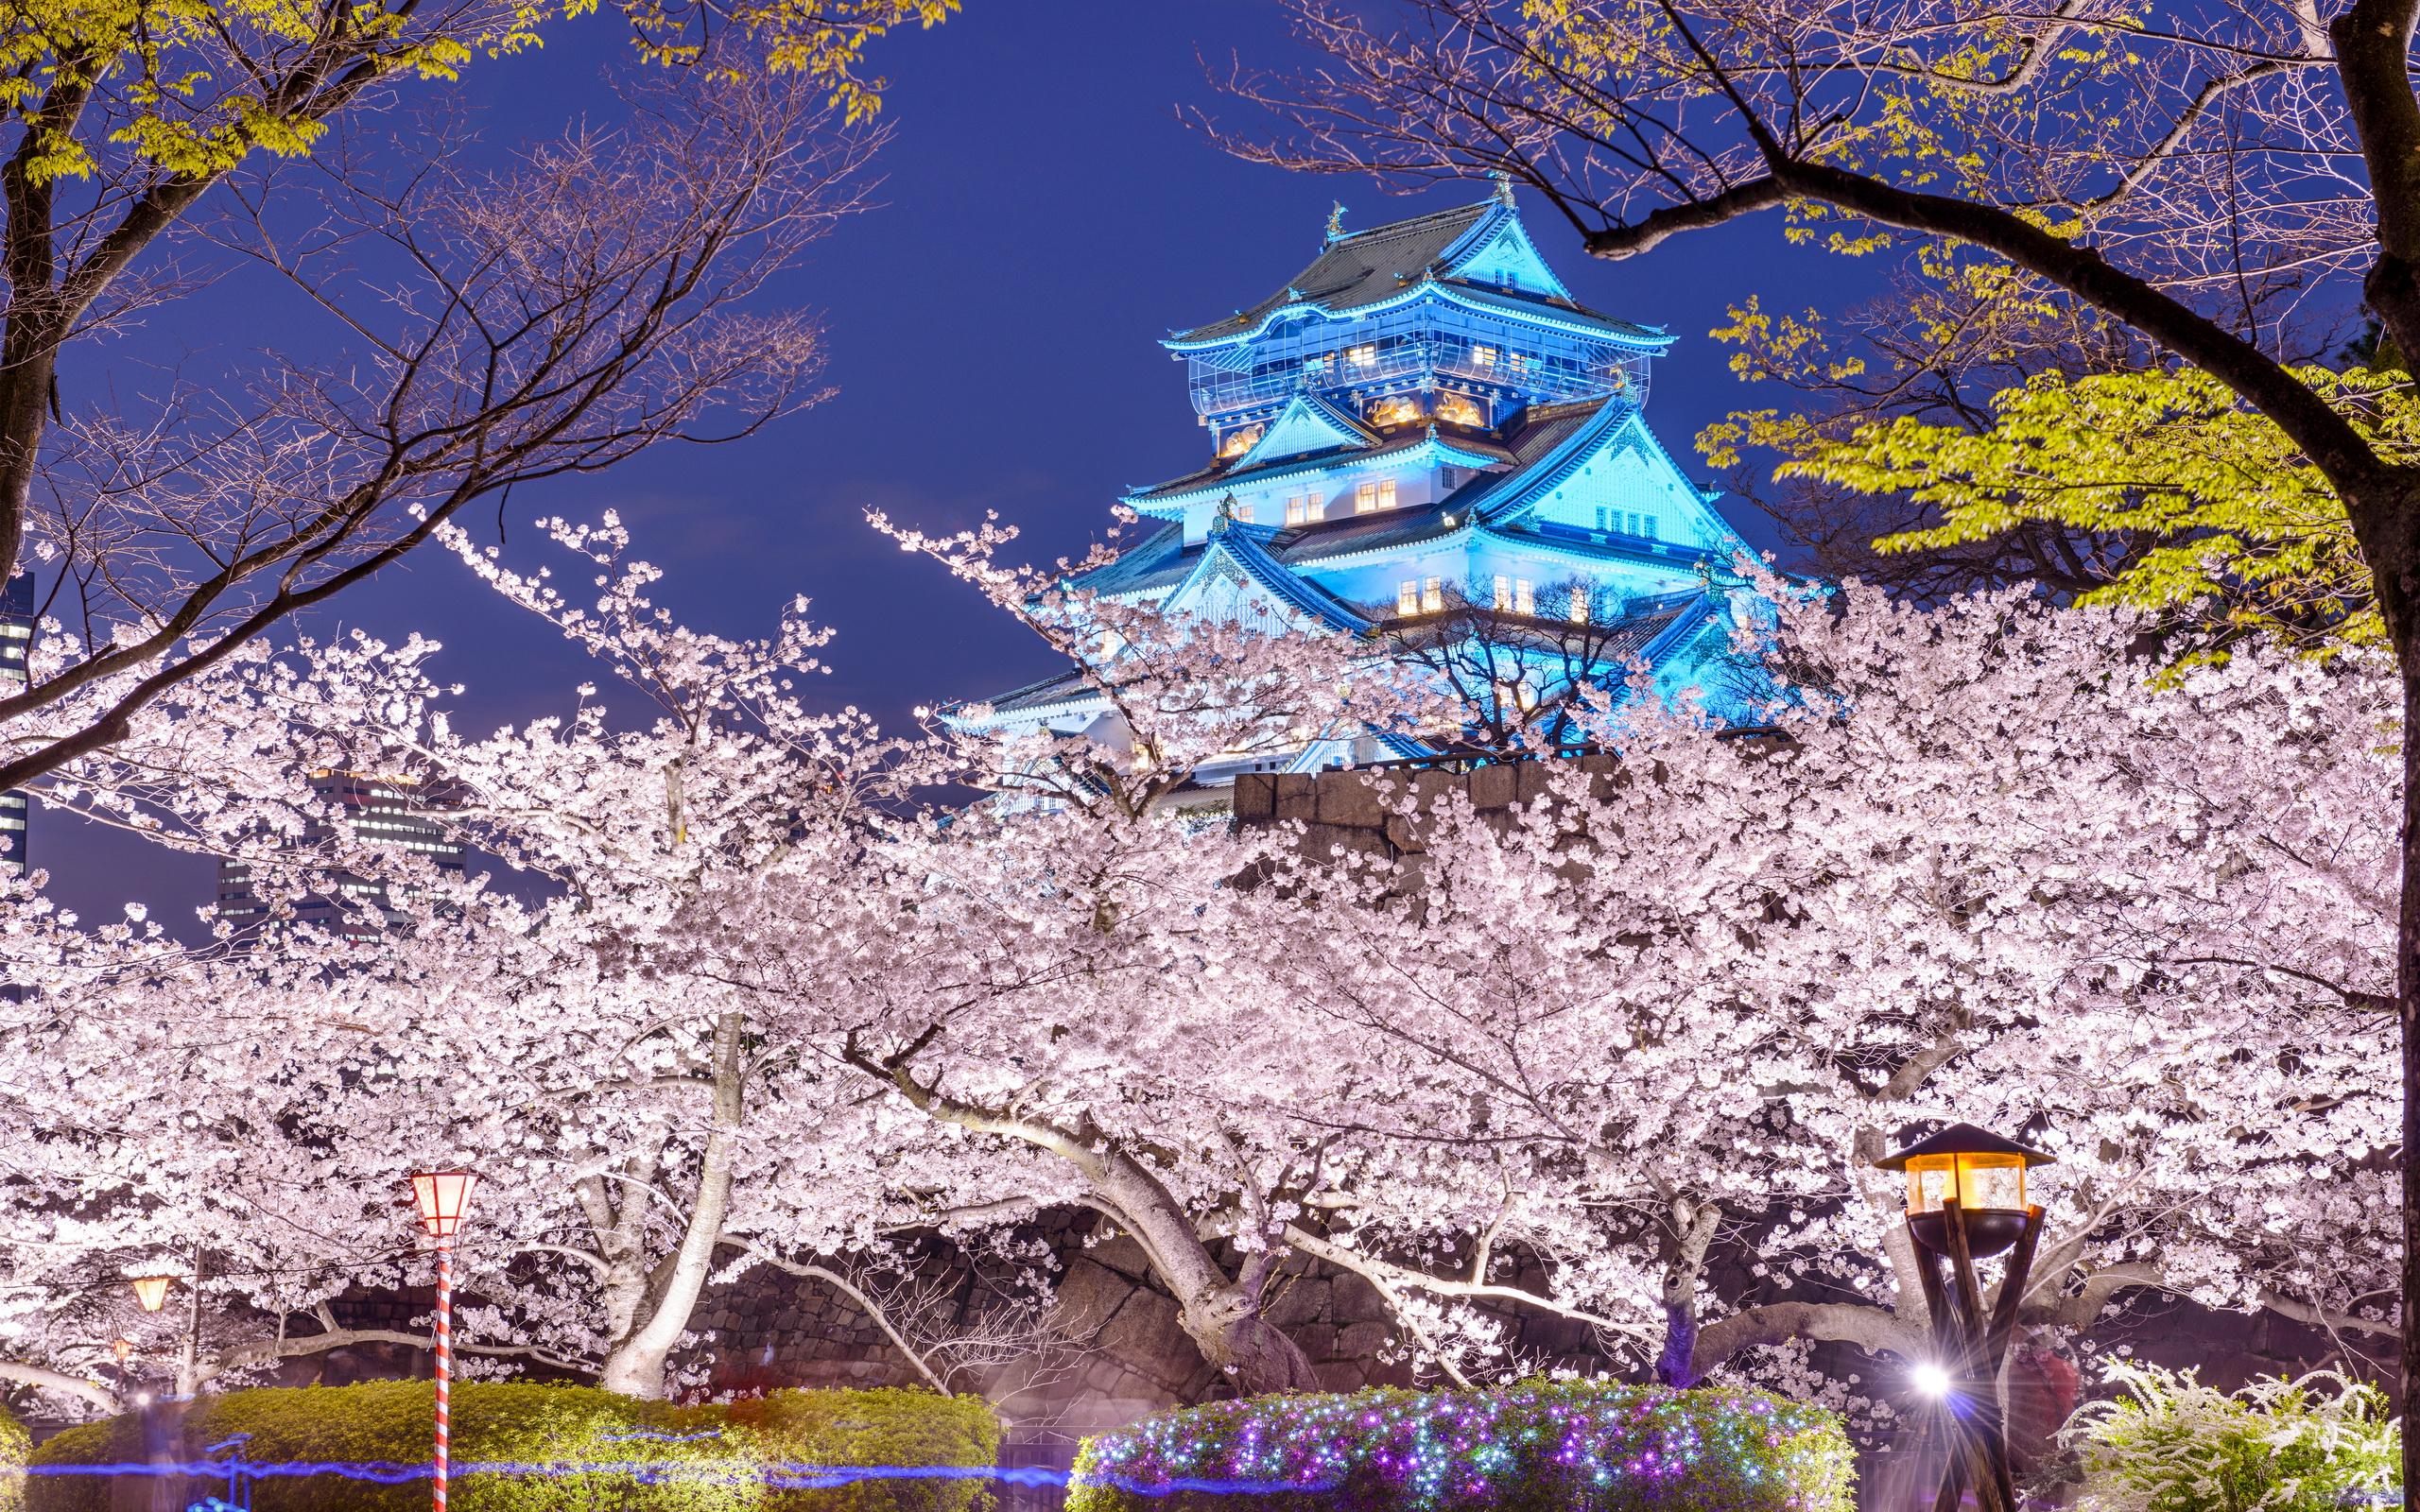 Cute Rainy Weather Wallpapers Osaka Castle Hd Wallpaper Background Image 2560x1600